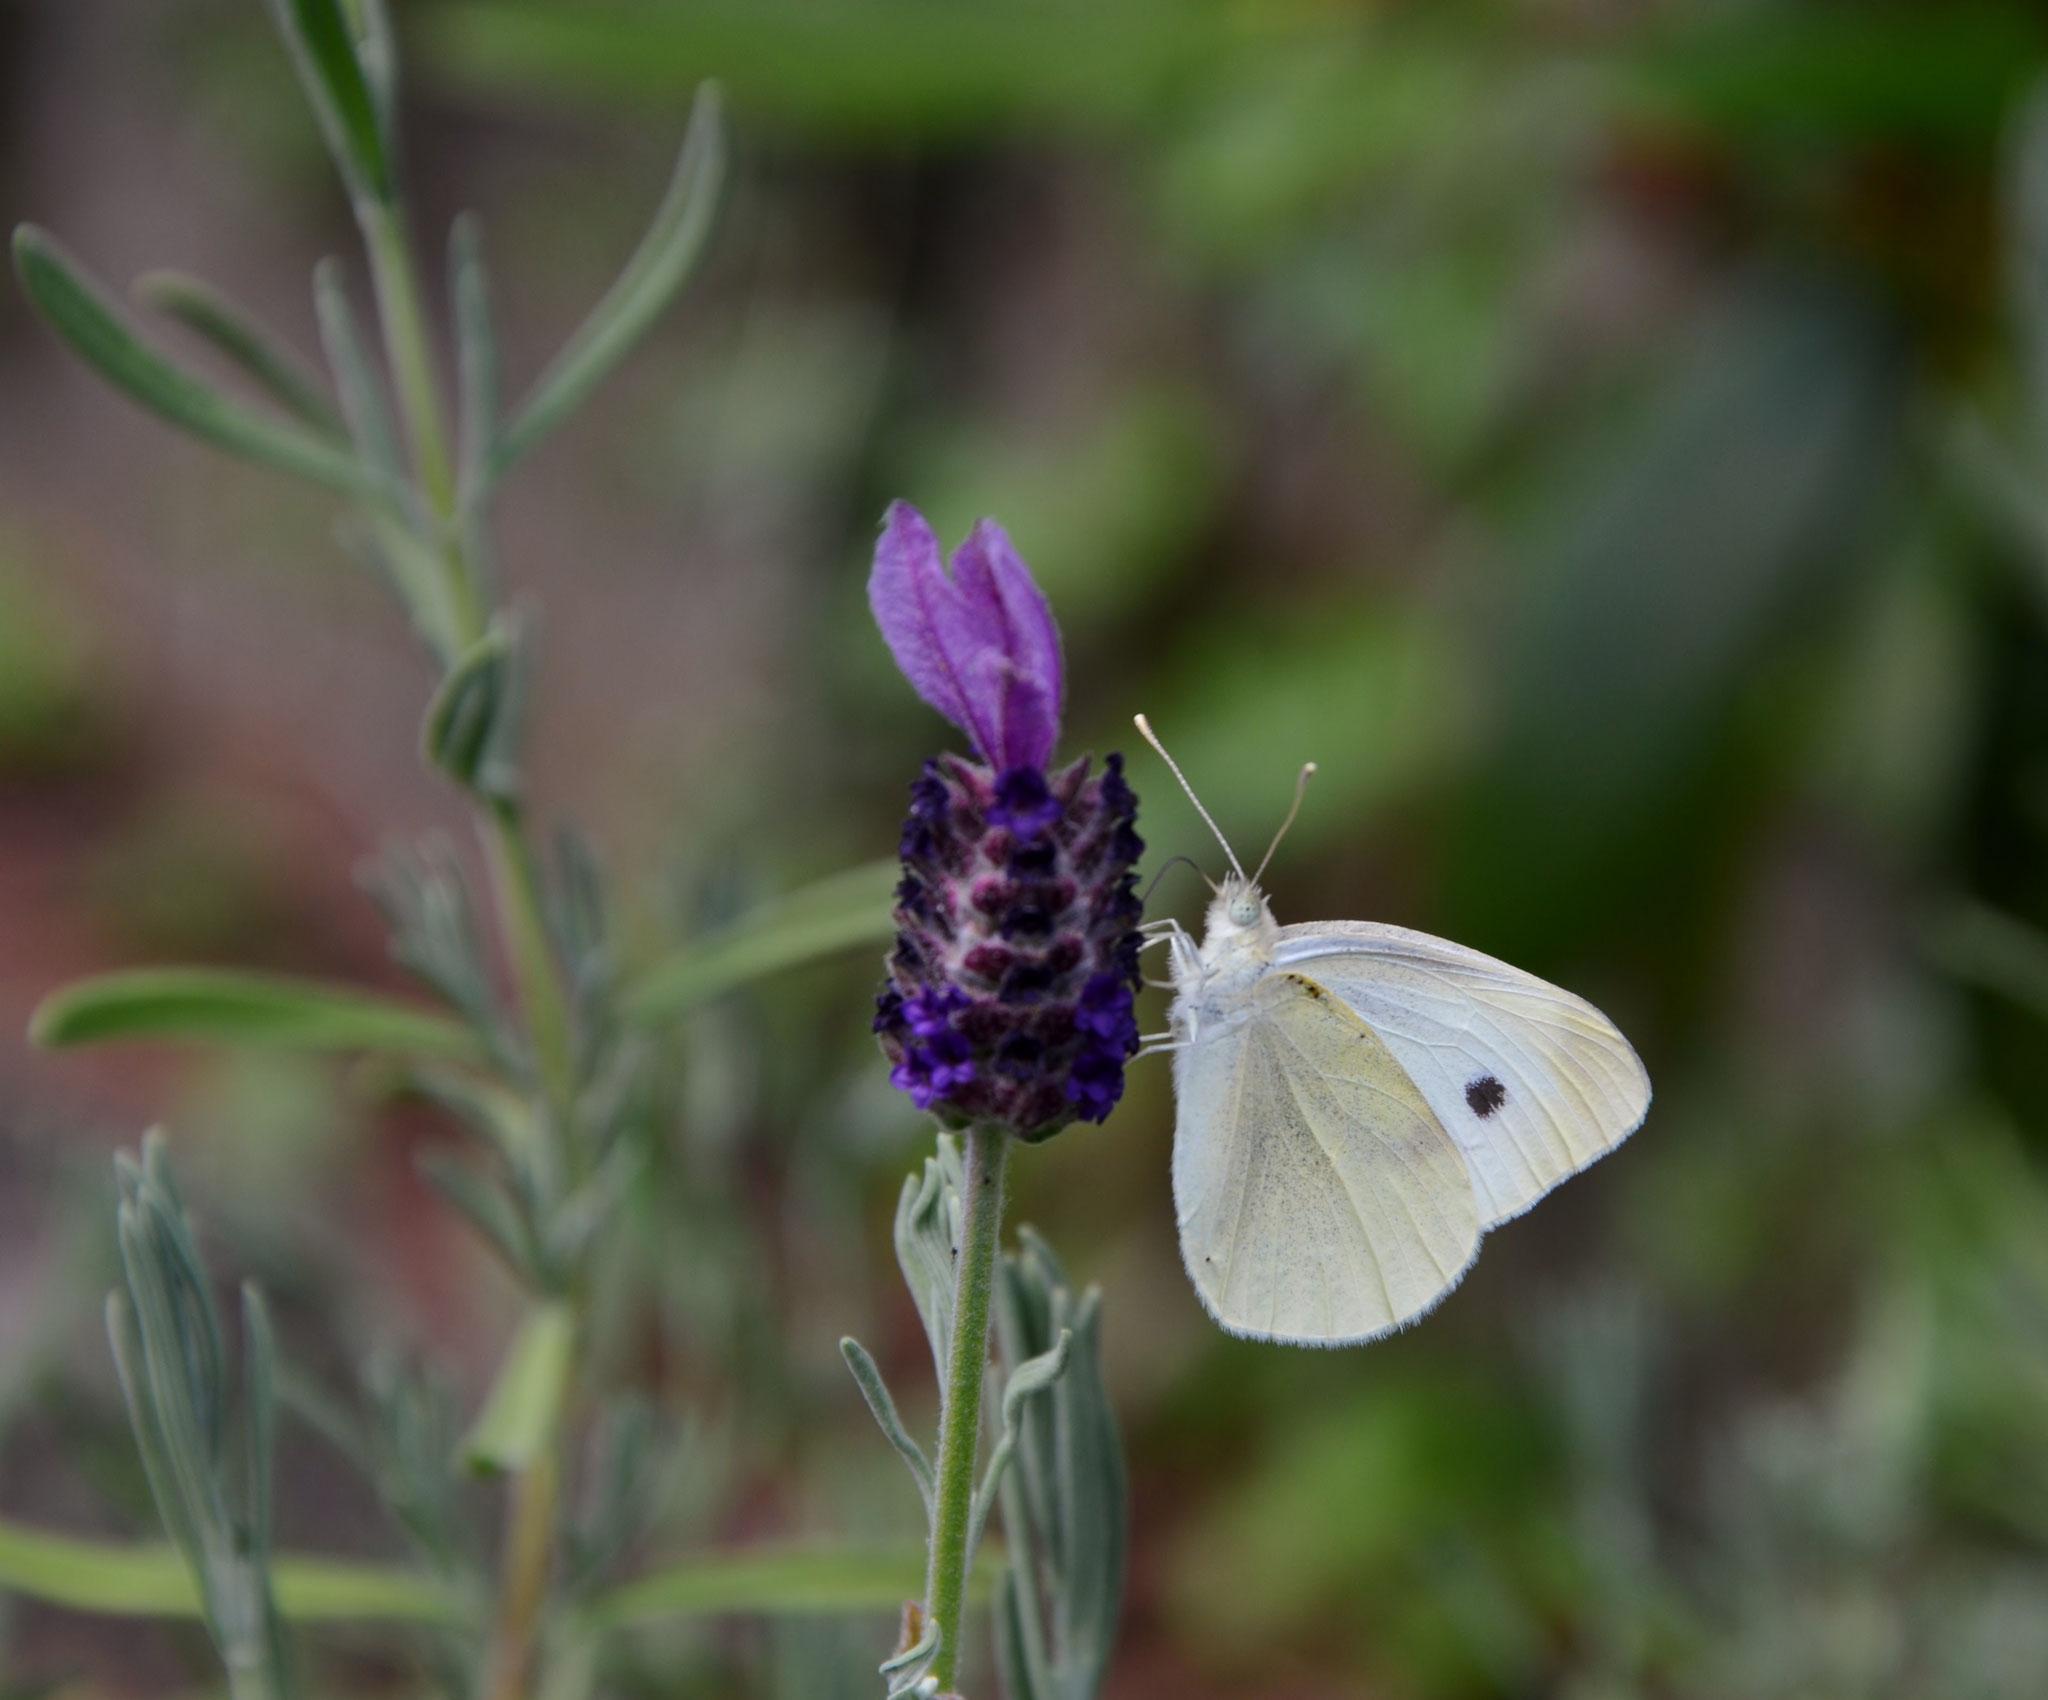 Kleiner Kohl-Weißling an Lavendelblüte